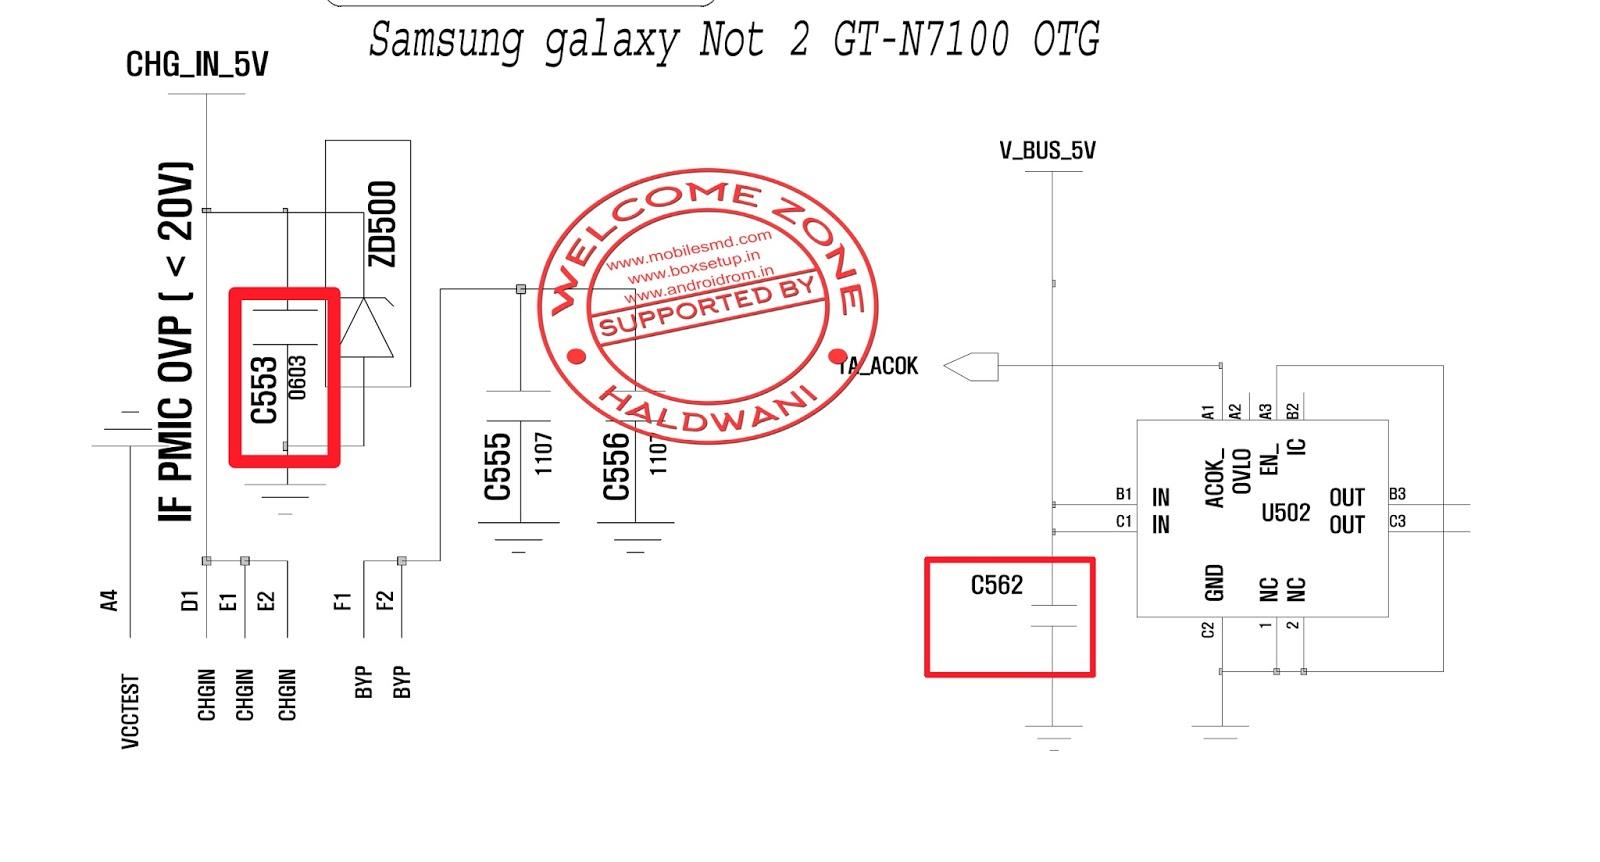 Samsung Galaxy Usb Wiring Diagram Pdf Mobile Circuit Otg Image Not 2 Gt N7100 Working